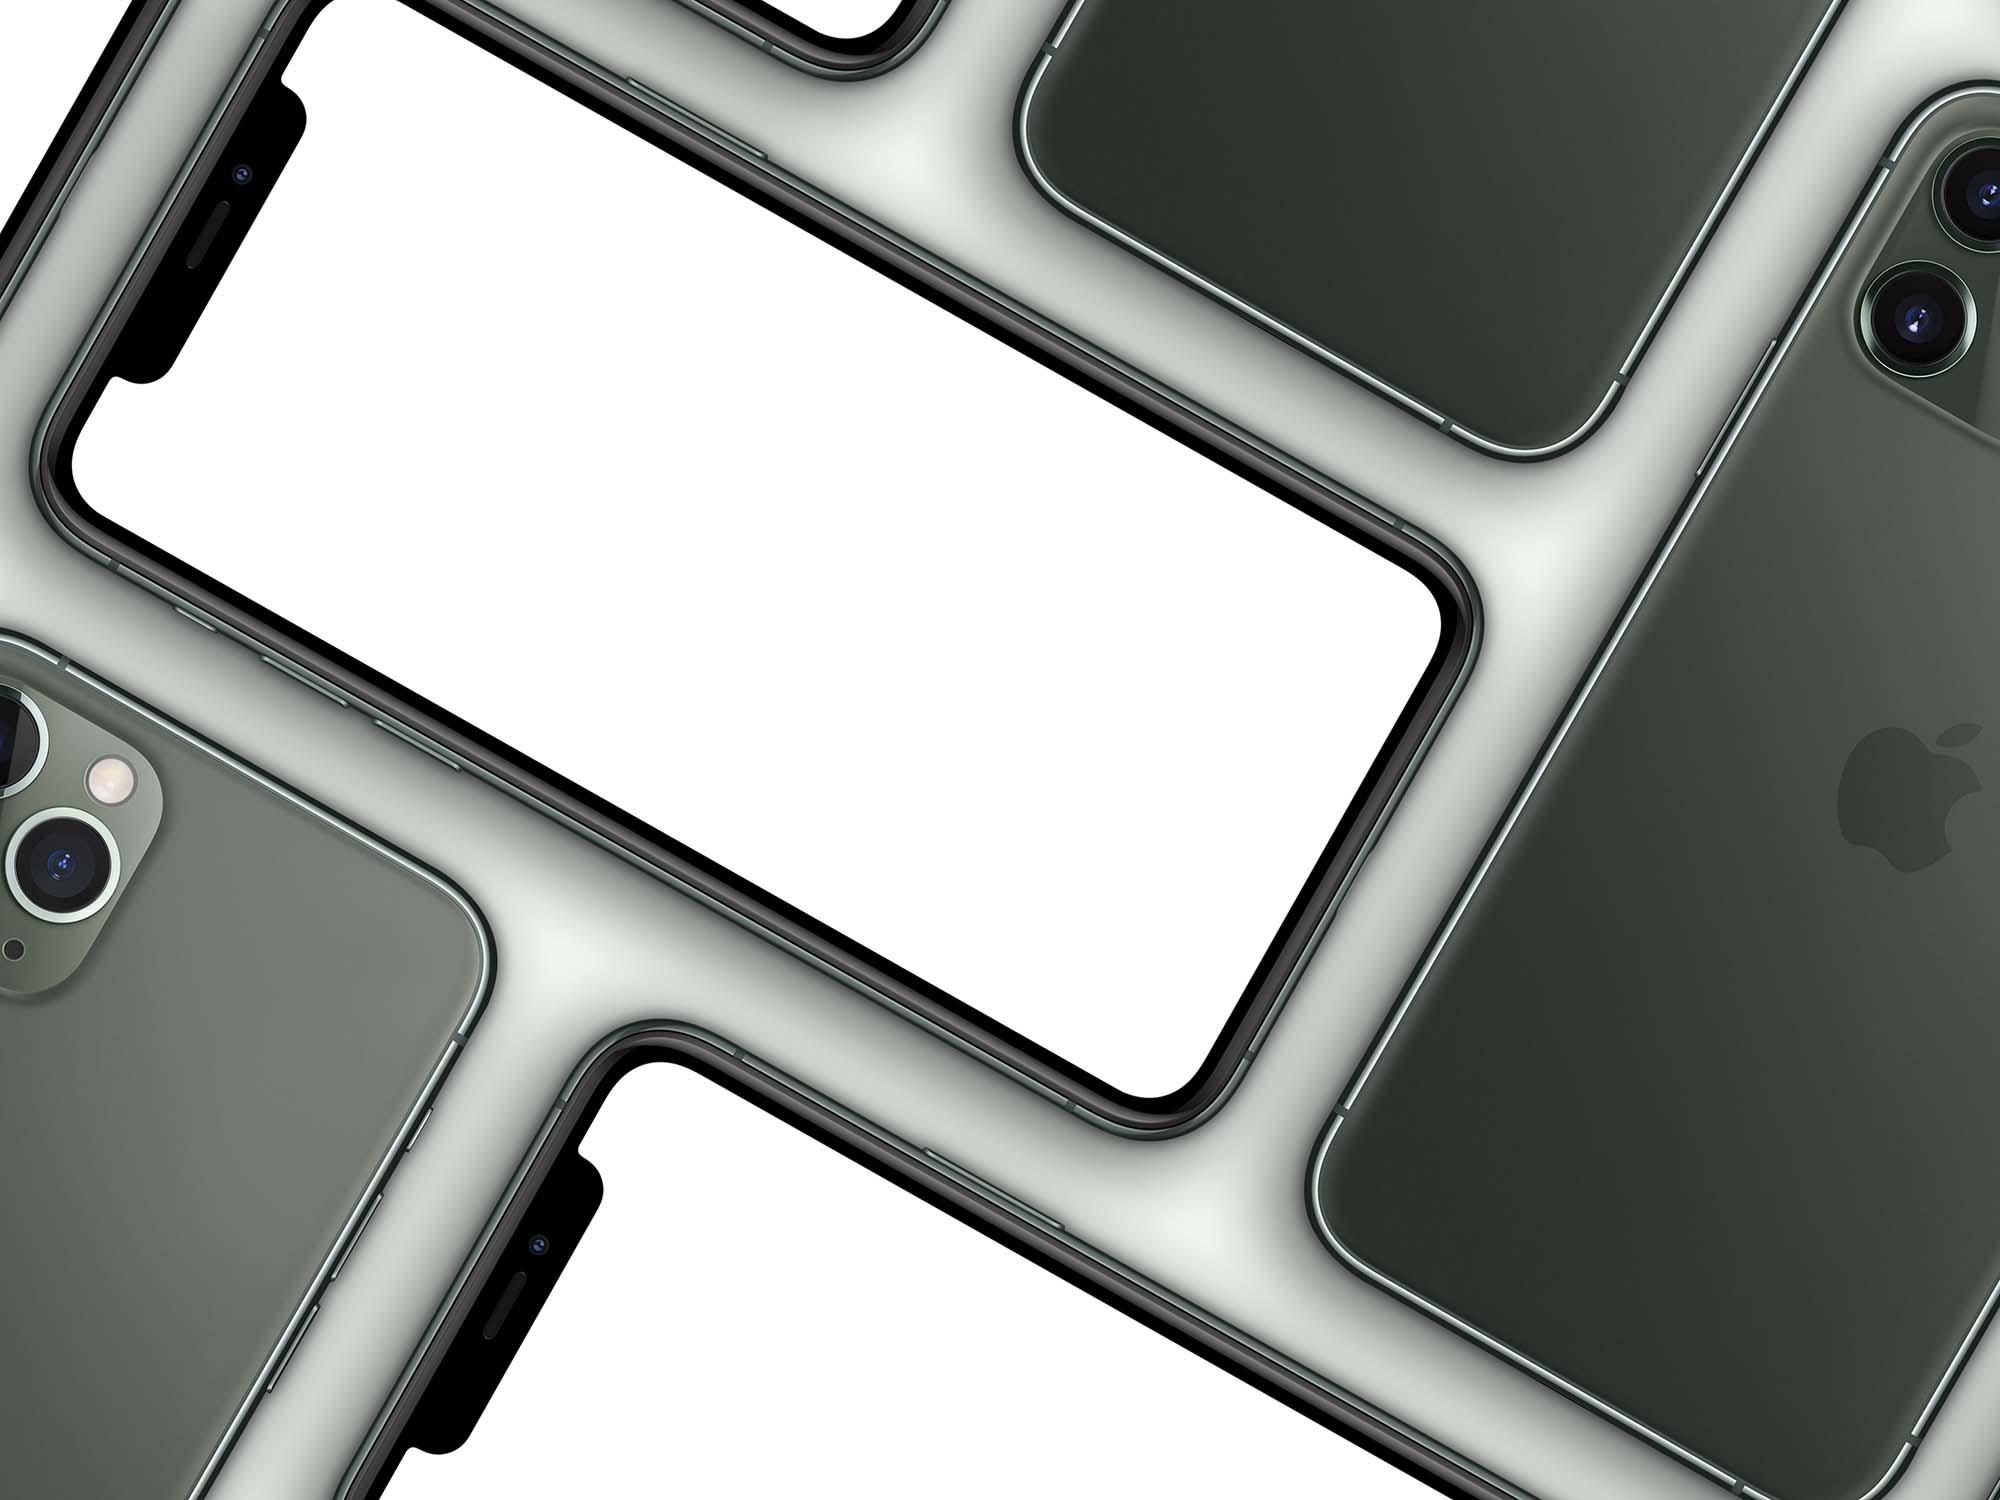 Multiple iPhone 11 Pro Max Mockup 2